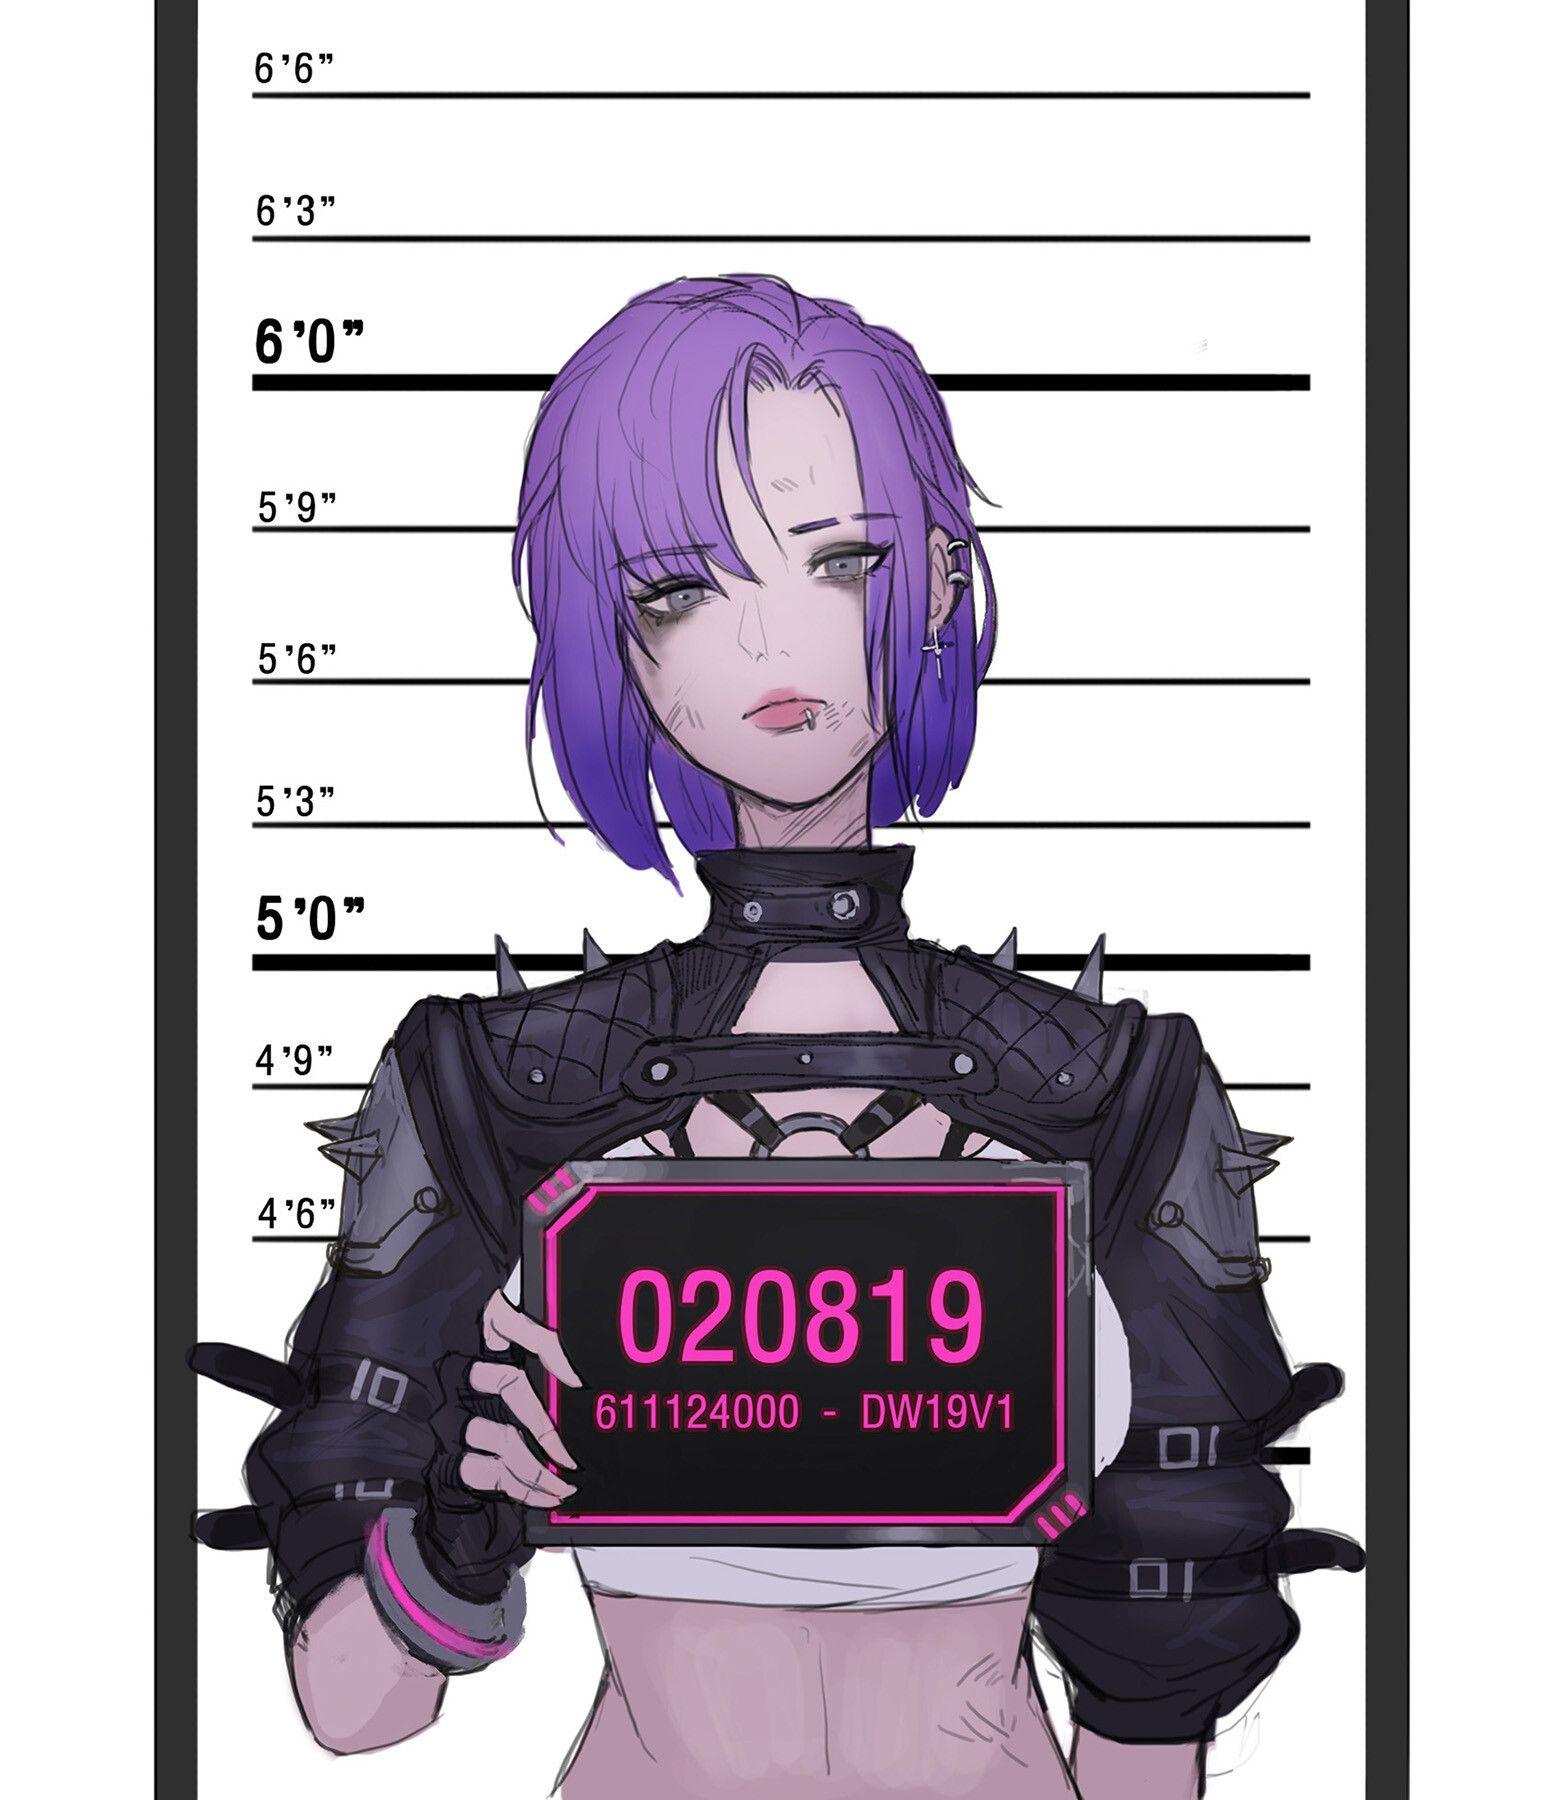 Artstation cyberpunk girl nitro cyberpunk girl